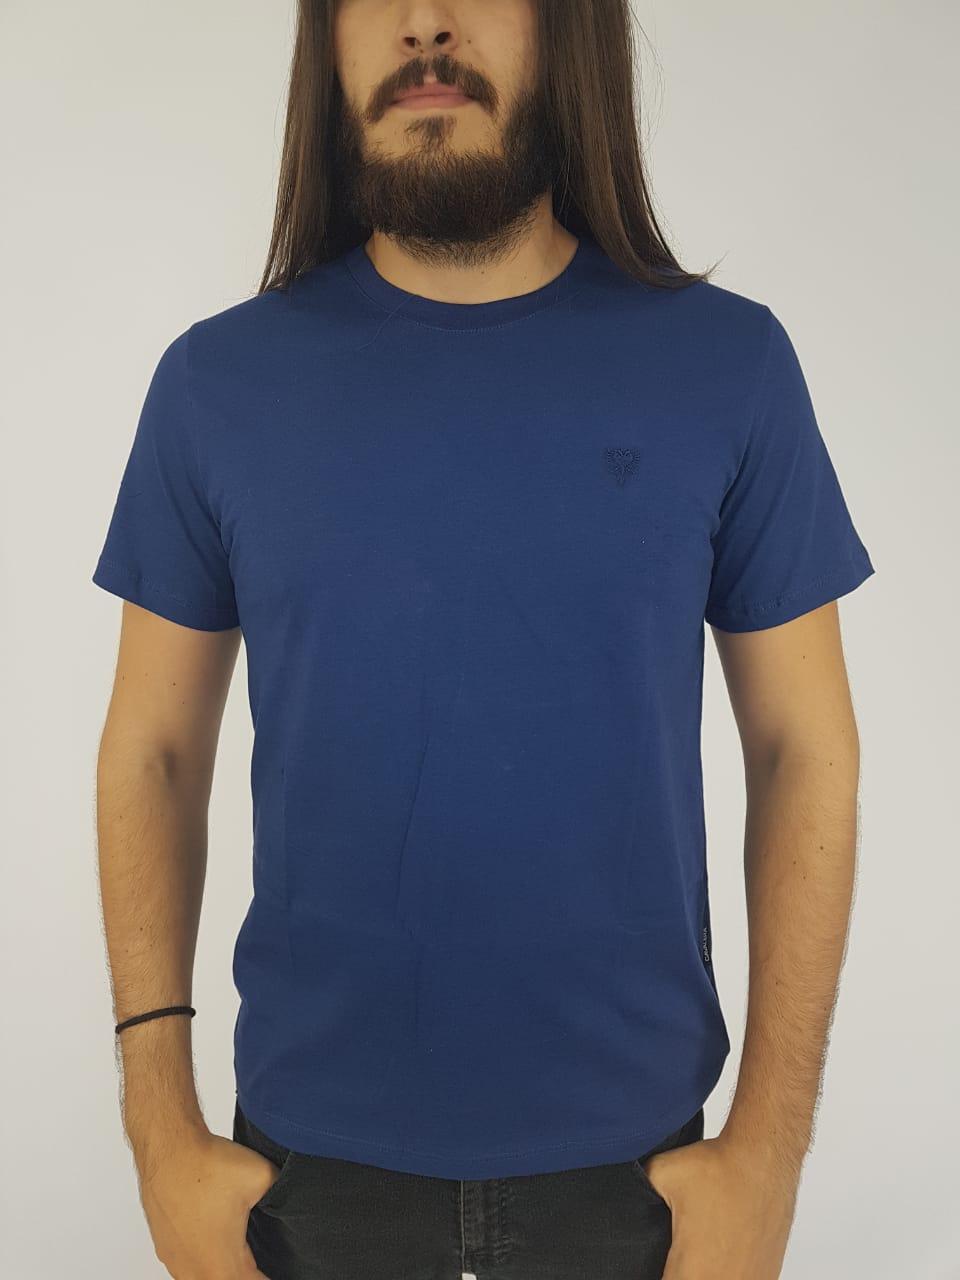 Camiseta Cavalera Masculina Manga Curta Básica  - Pick Tita